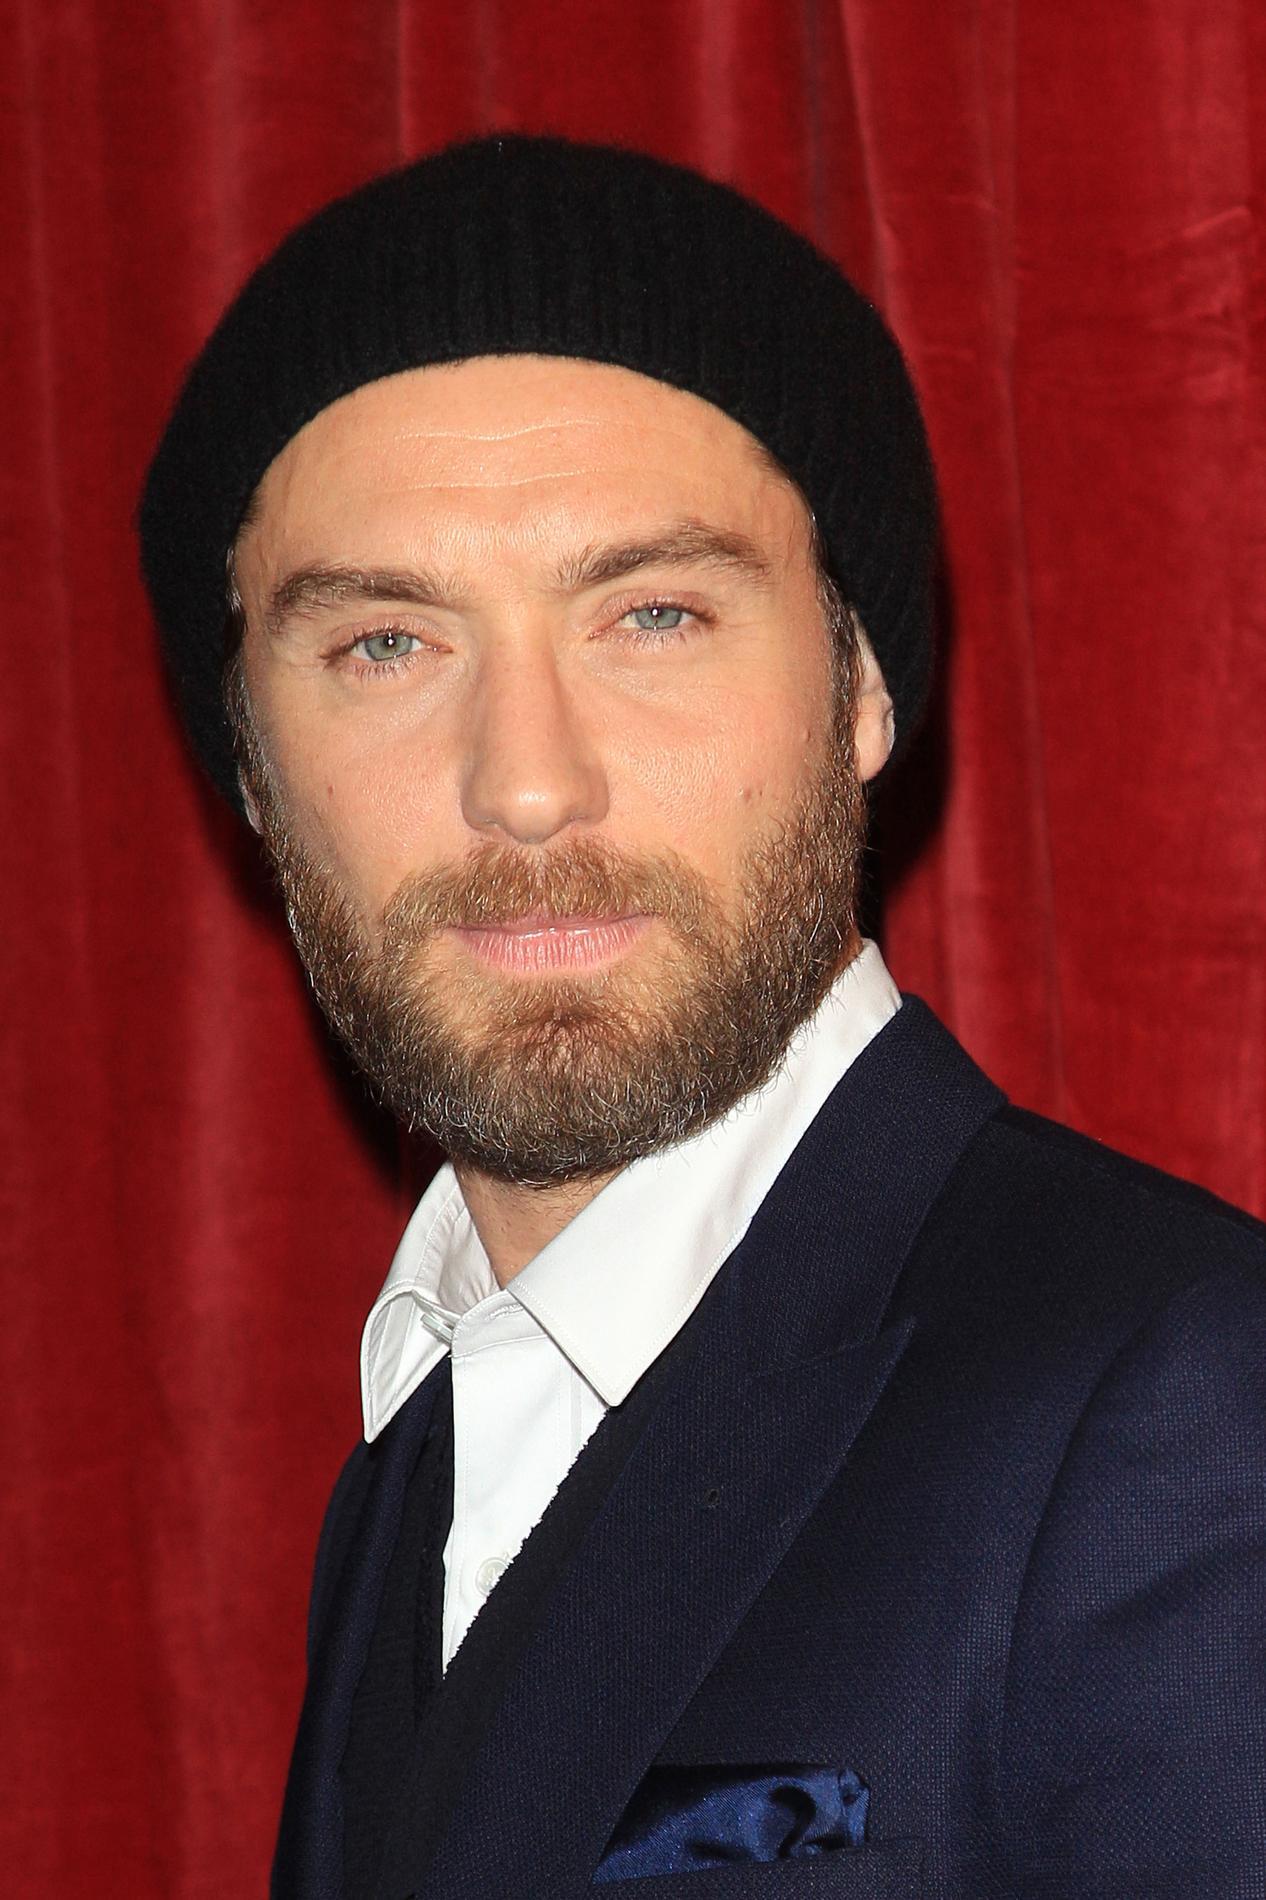 Zac Effron Hommes   quel bonnet pour quel look   - photo 4 Photos Abaca Jon  Hamm Jake Gyllenhaal Orlando Bloom Justin Bieber Robert Pattinson Justin ... 4bafc44546c4